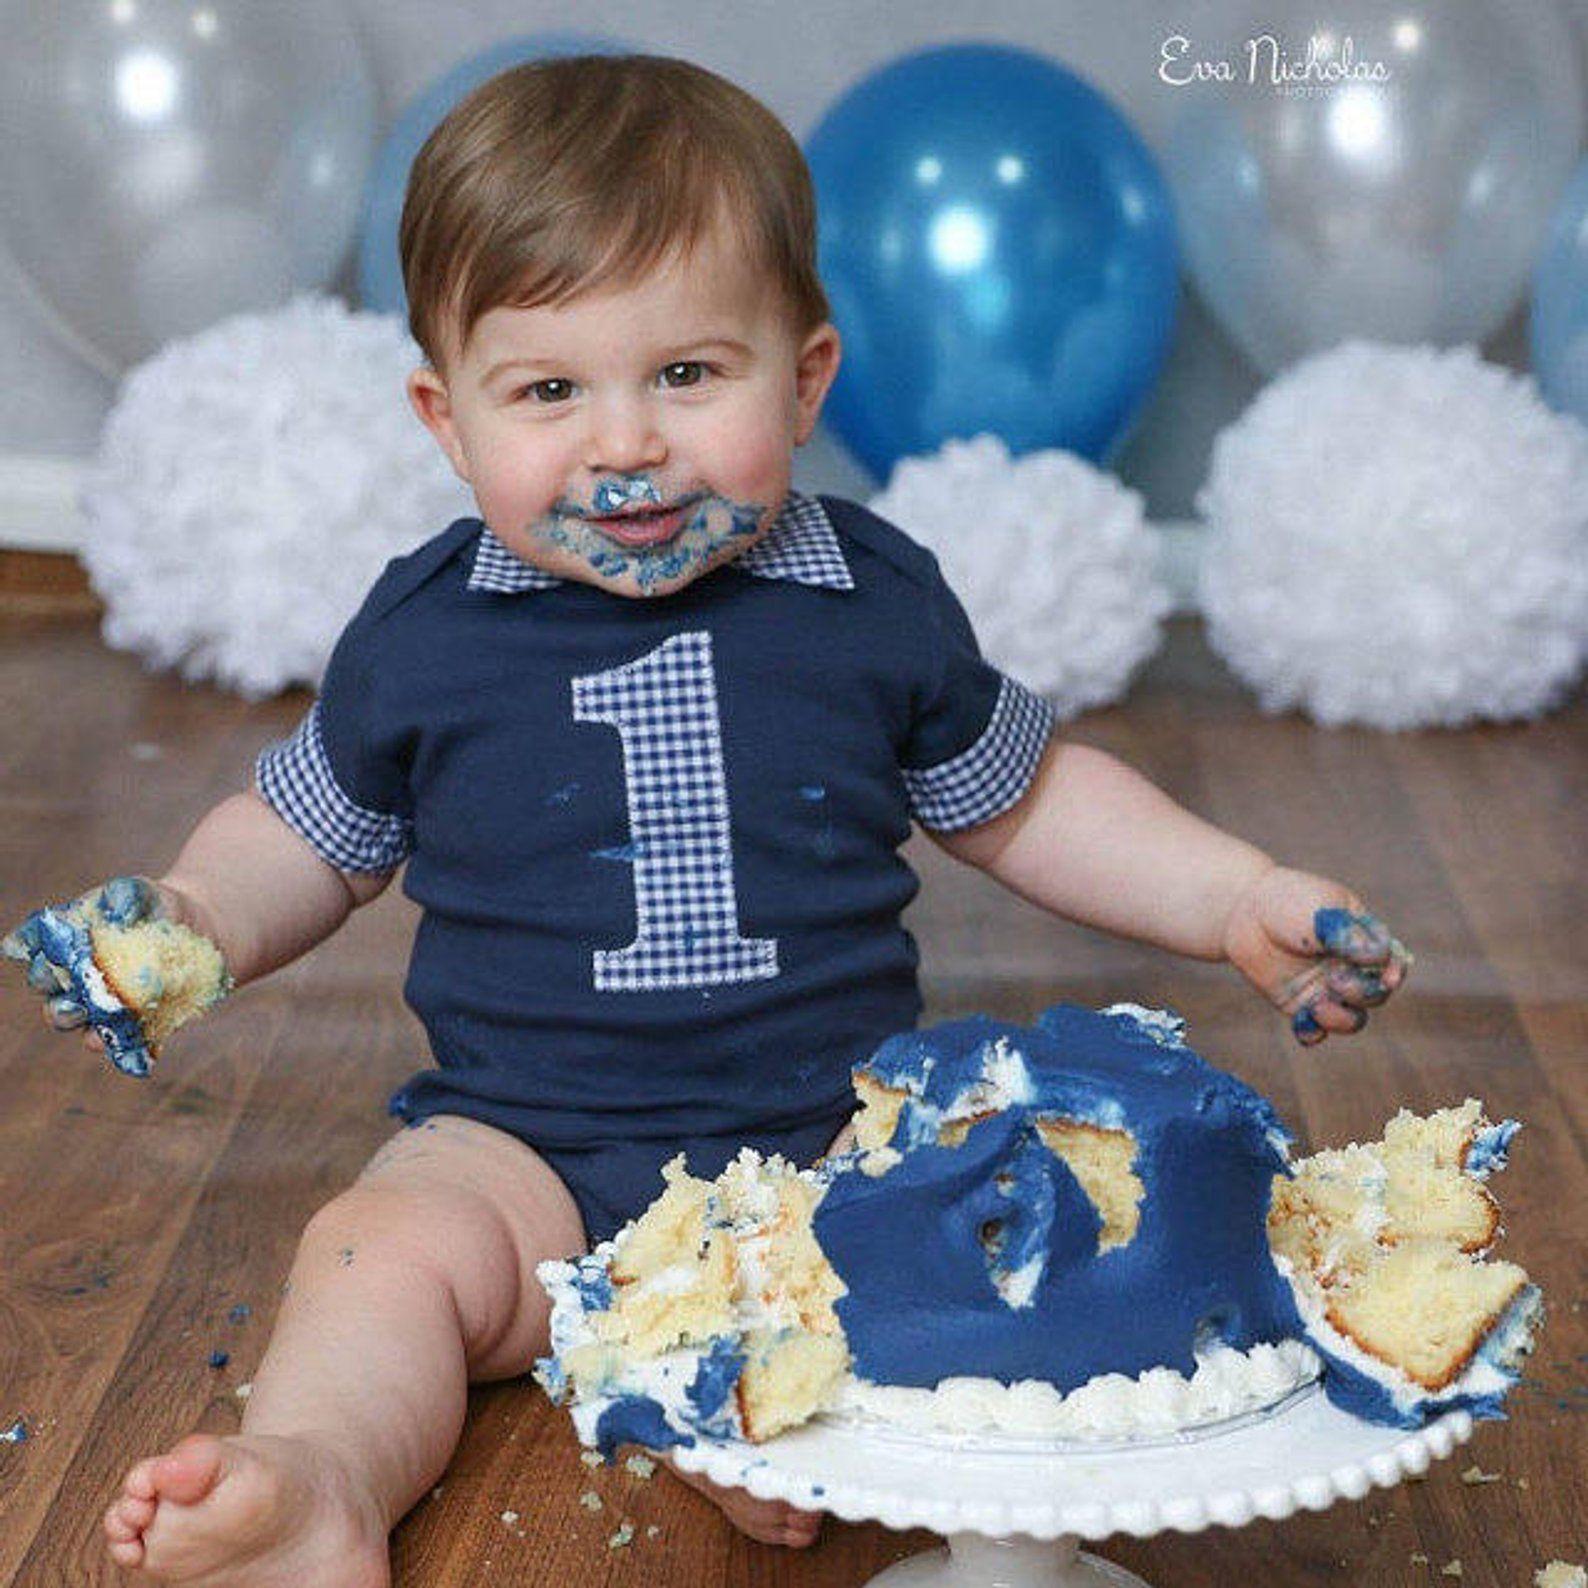 Astounding First Birthday Outfit Boy Cake Smash Outfit Boys Cake Smash Personalised Birthday Cards Petedlily Jamesorg